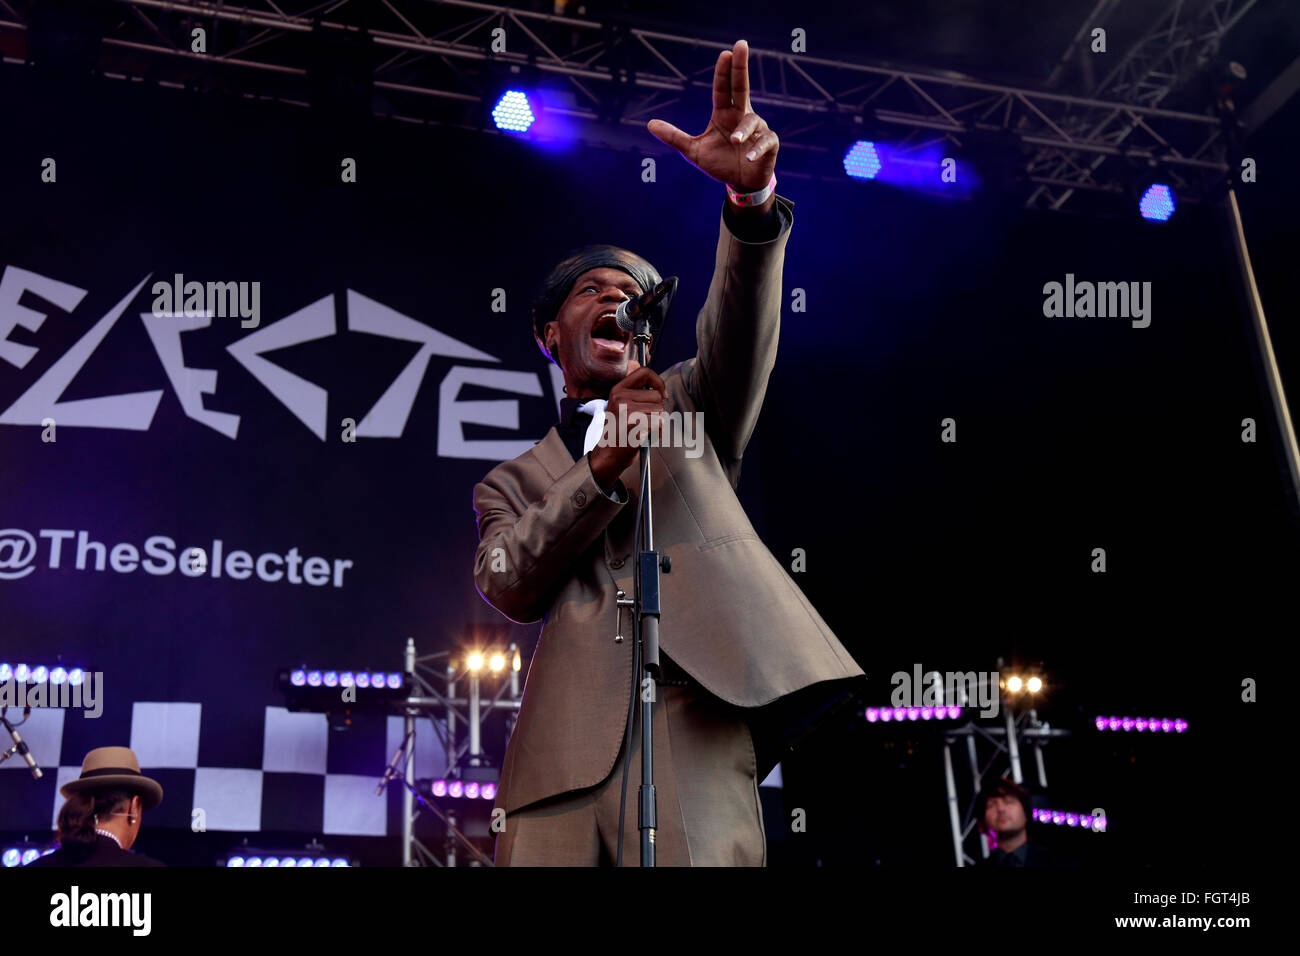 The Selecter, Village Green Music and Arts Festival, Southend-on-Sea, Essex © Clarissa Debenham / Alamy Stock Photo